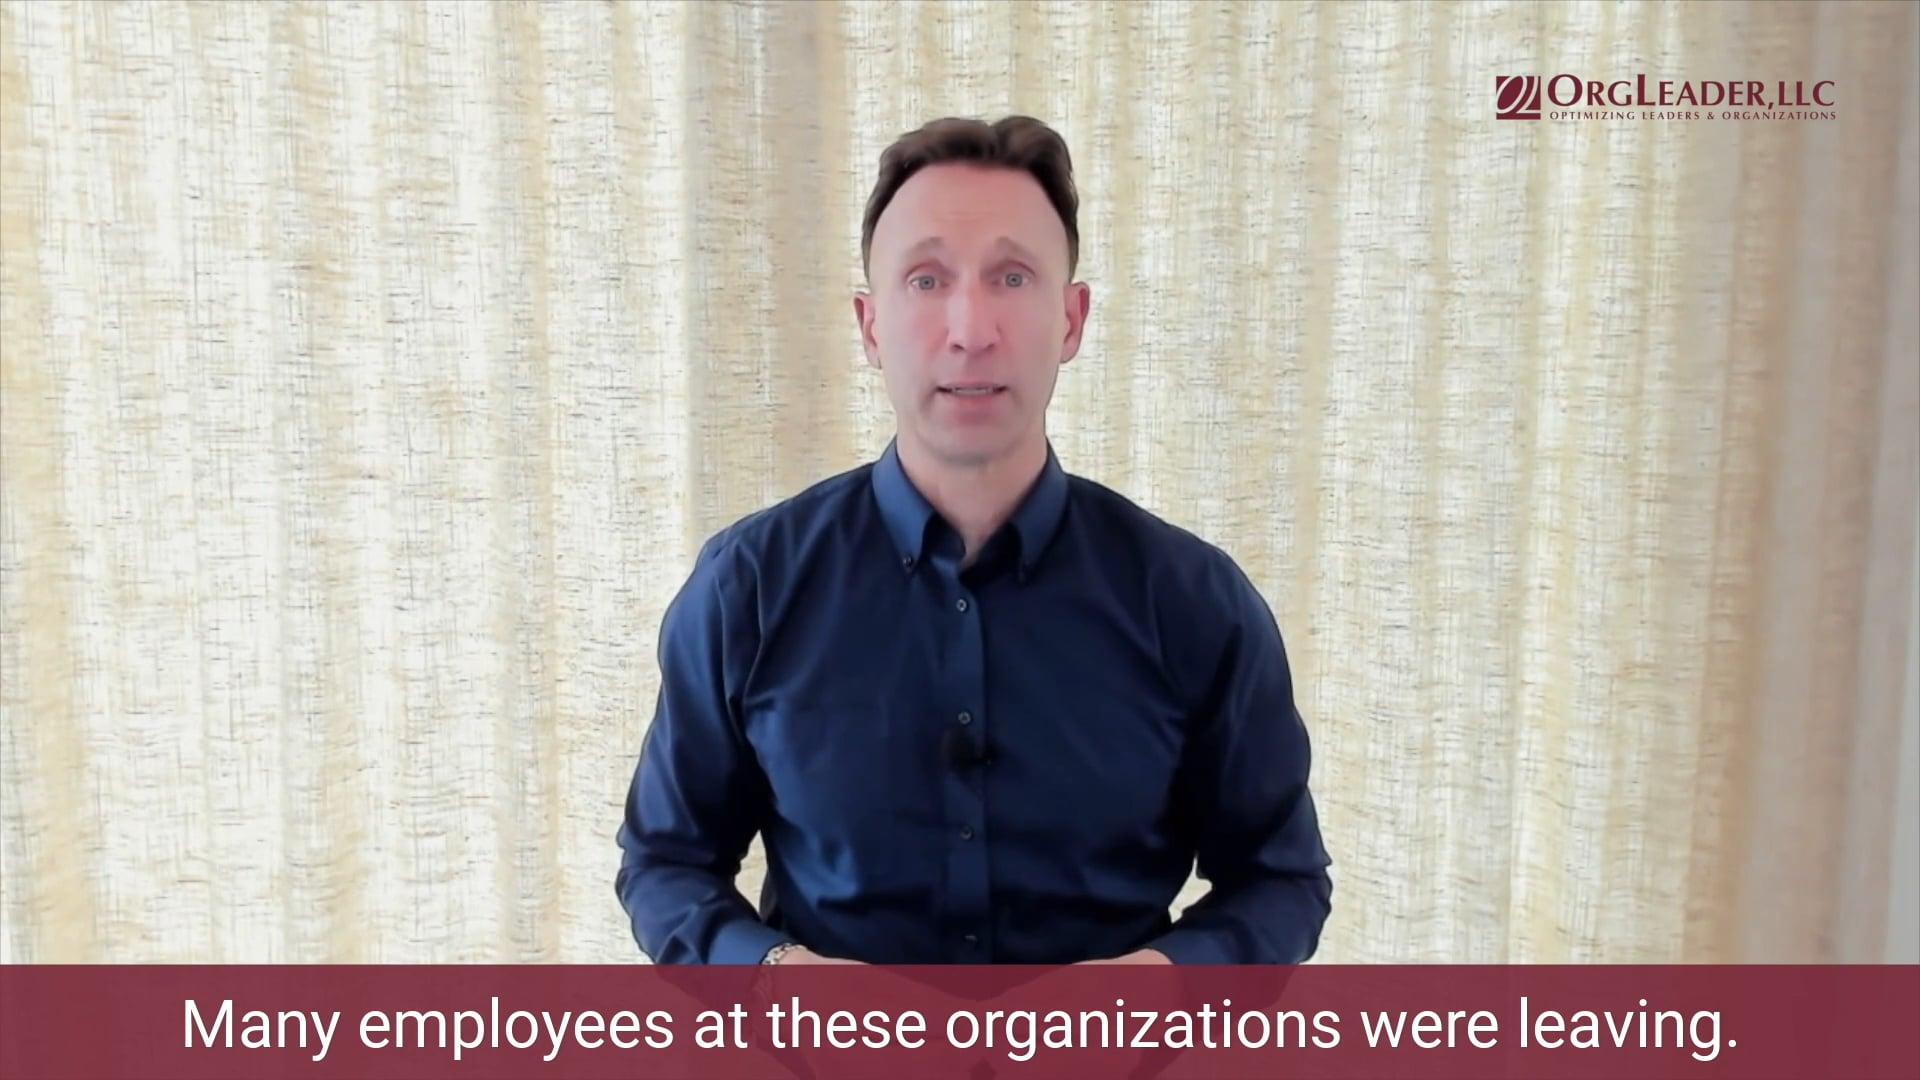 Ryan Lahti - Common Challenges in STEM Organizations